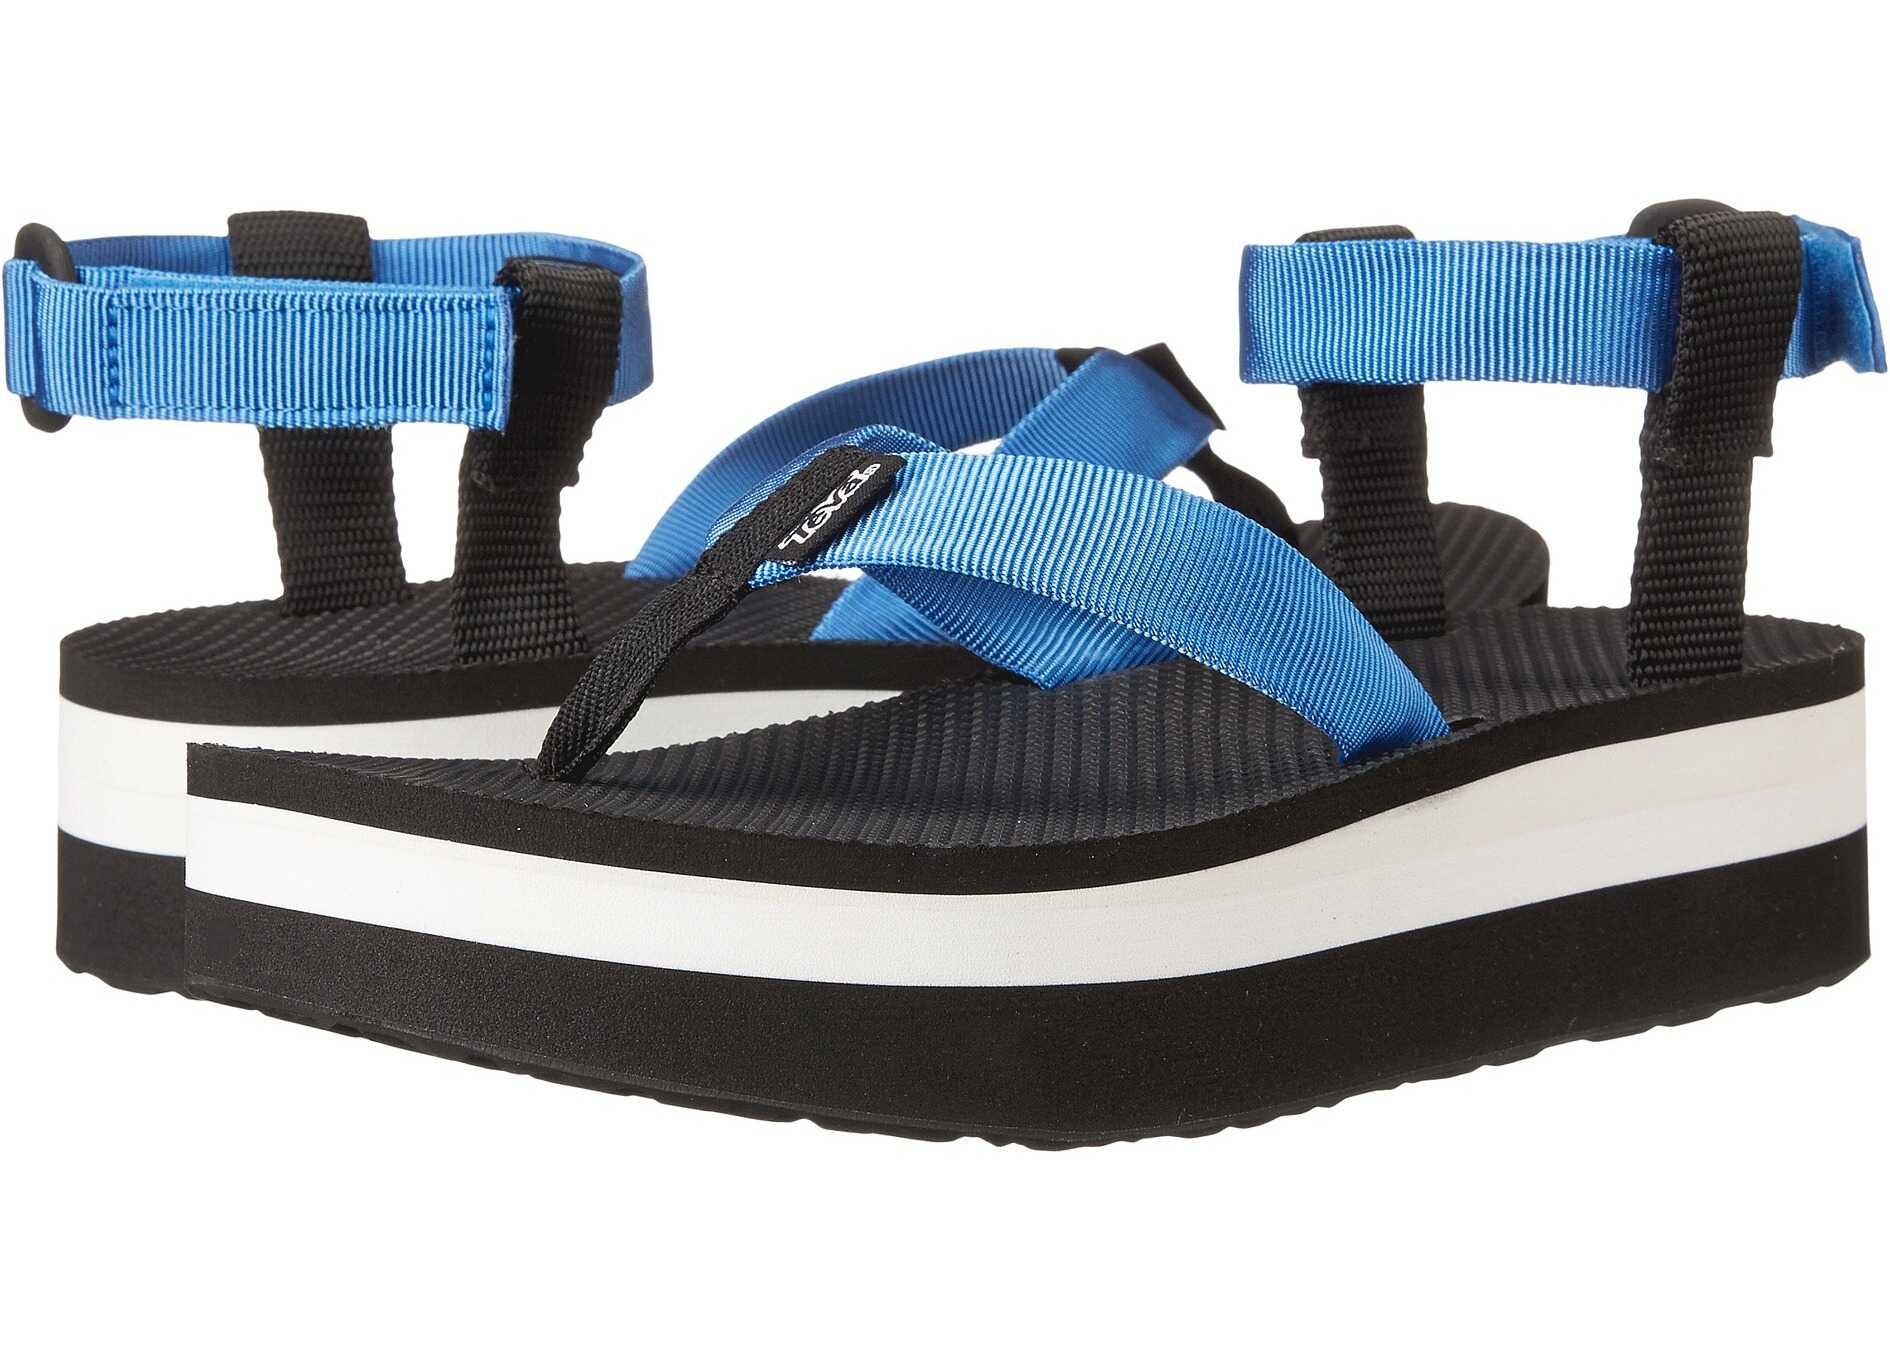 Teva Flatform Sandal French Blue